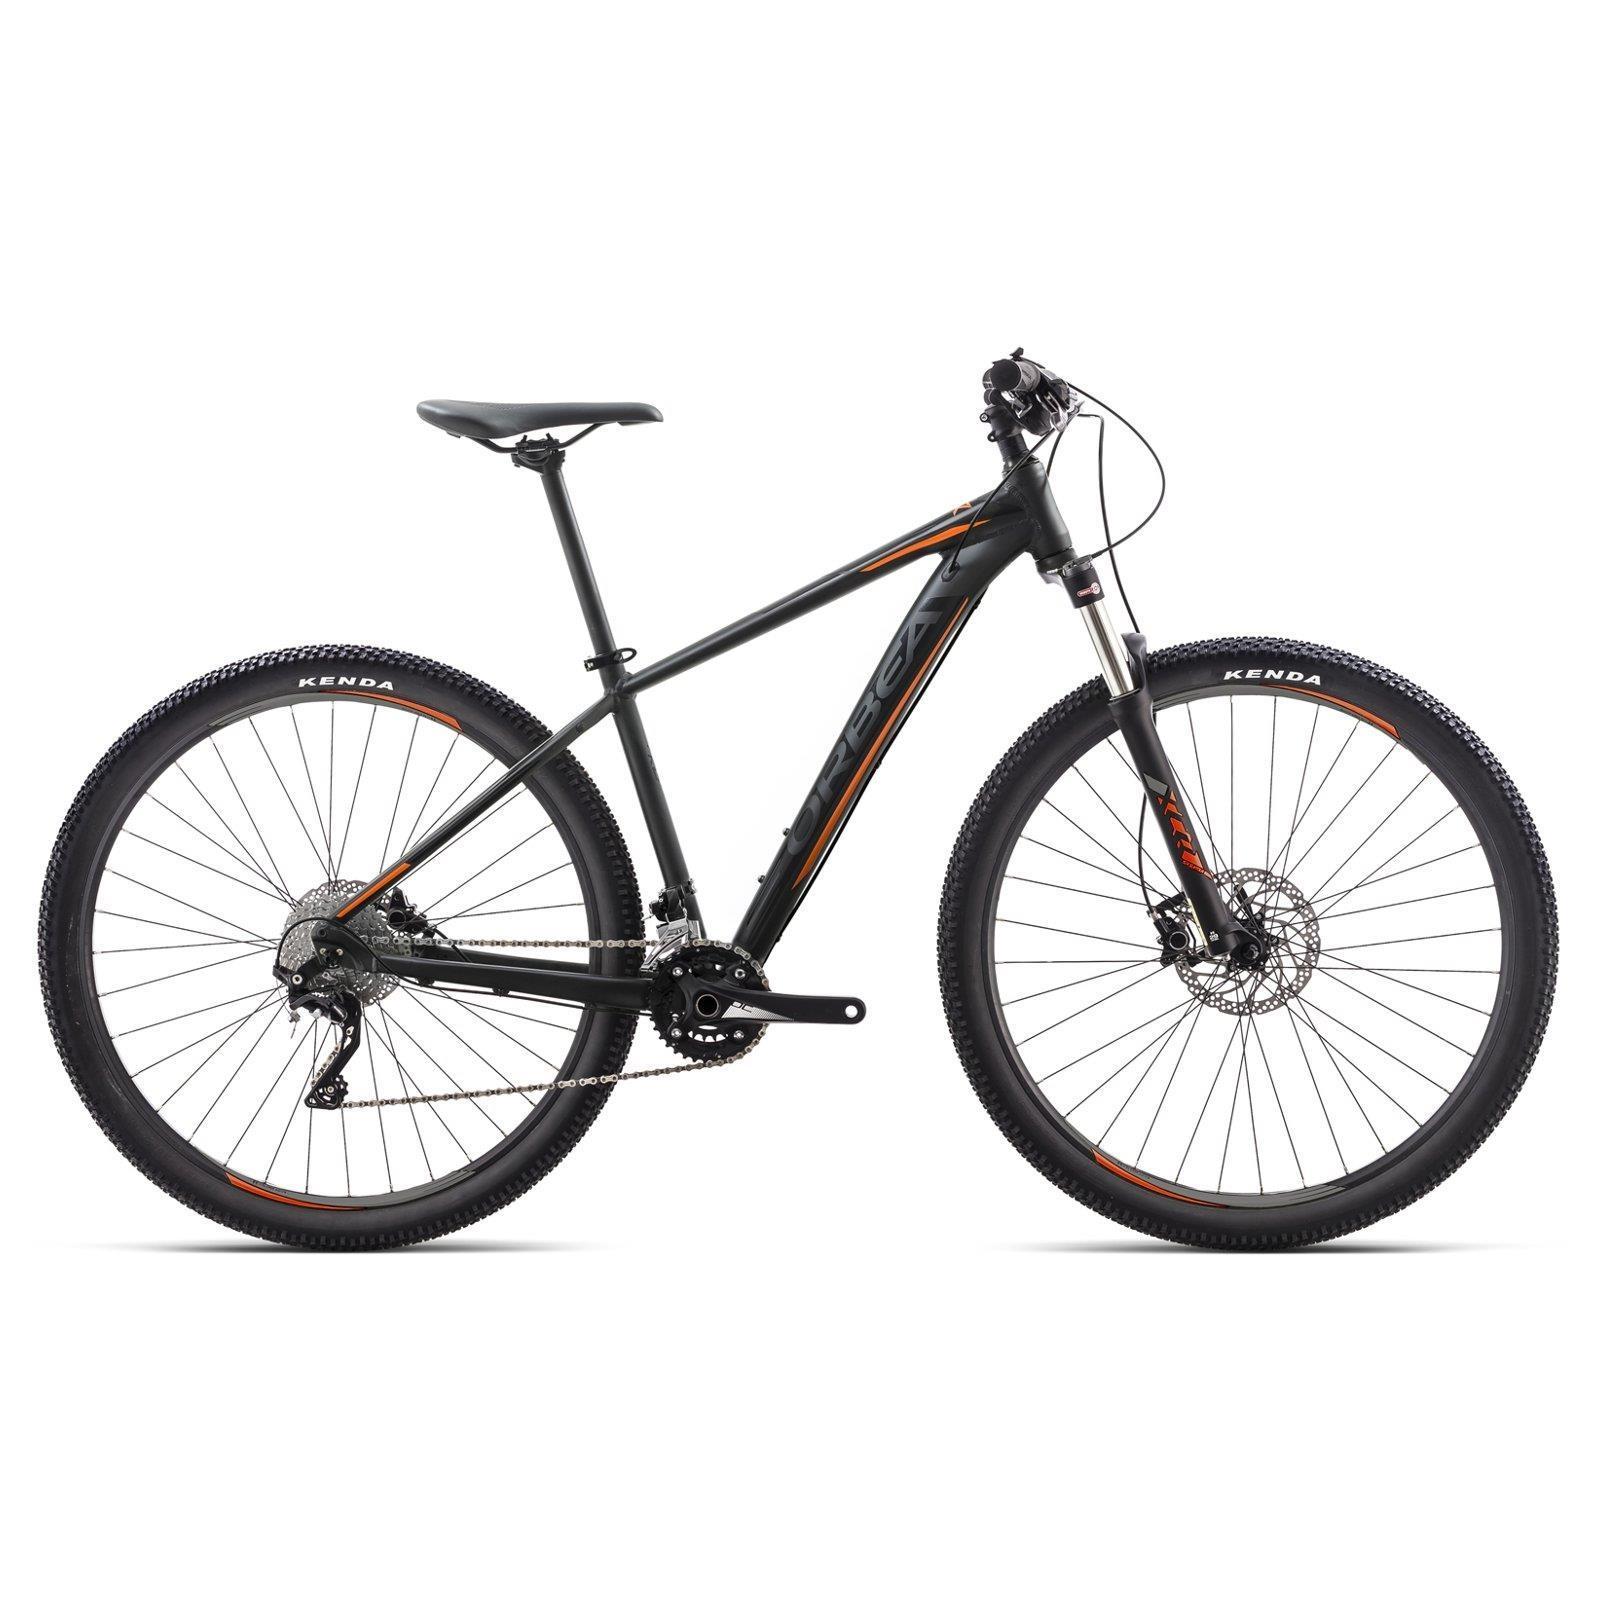 orbea mx 20 29 zoll m mtb fahrrad 20 gang mountain bike. Black Bedroom Furniture Sets. Home Design Ideas